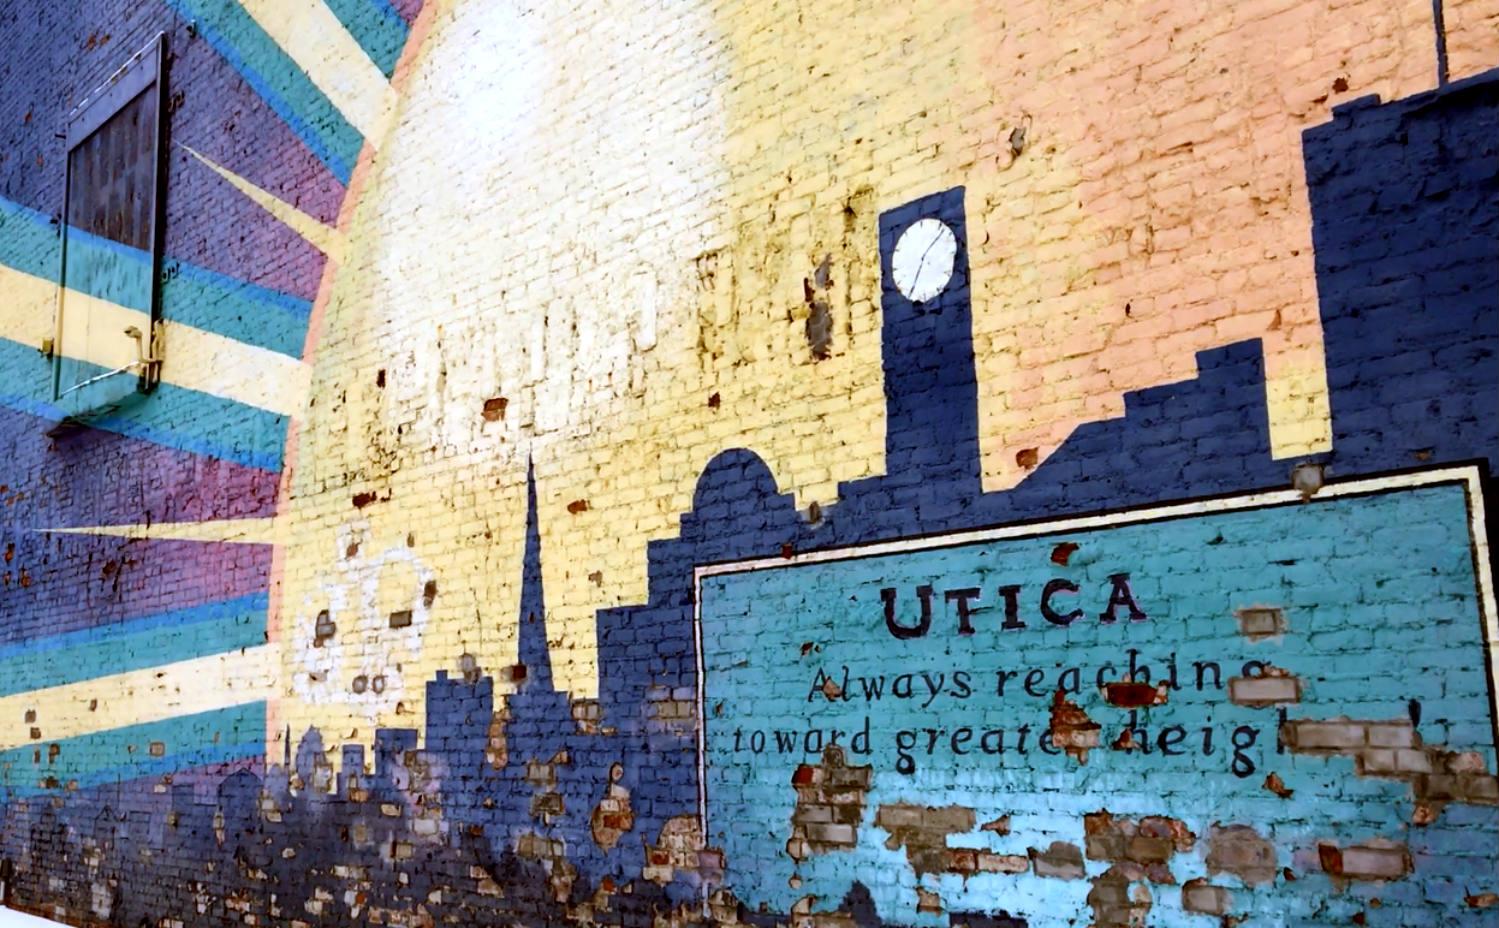 Utica Food Tour 2017 - Featured Image